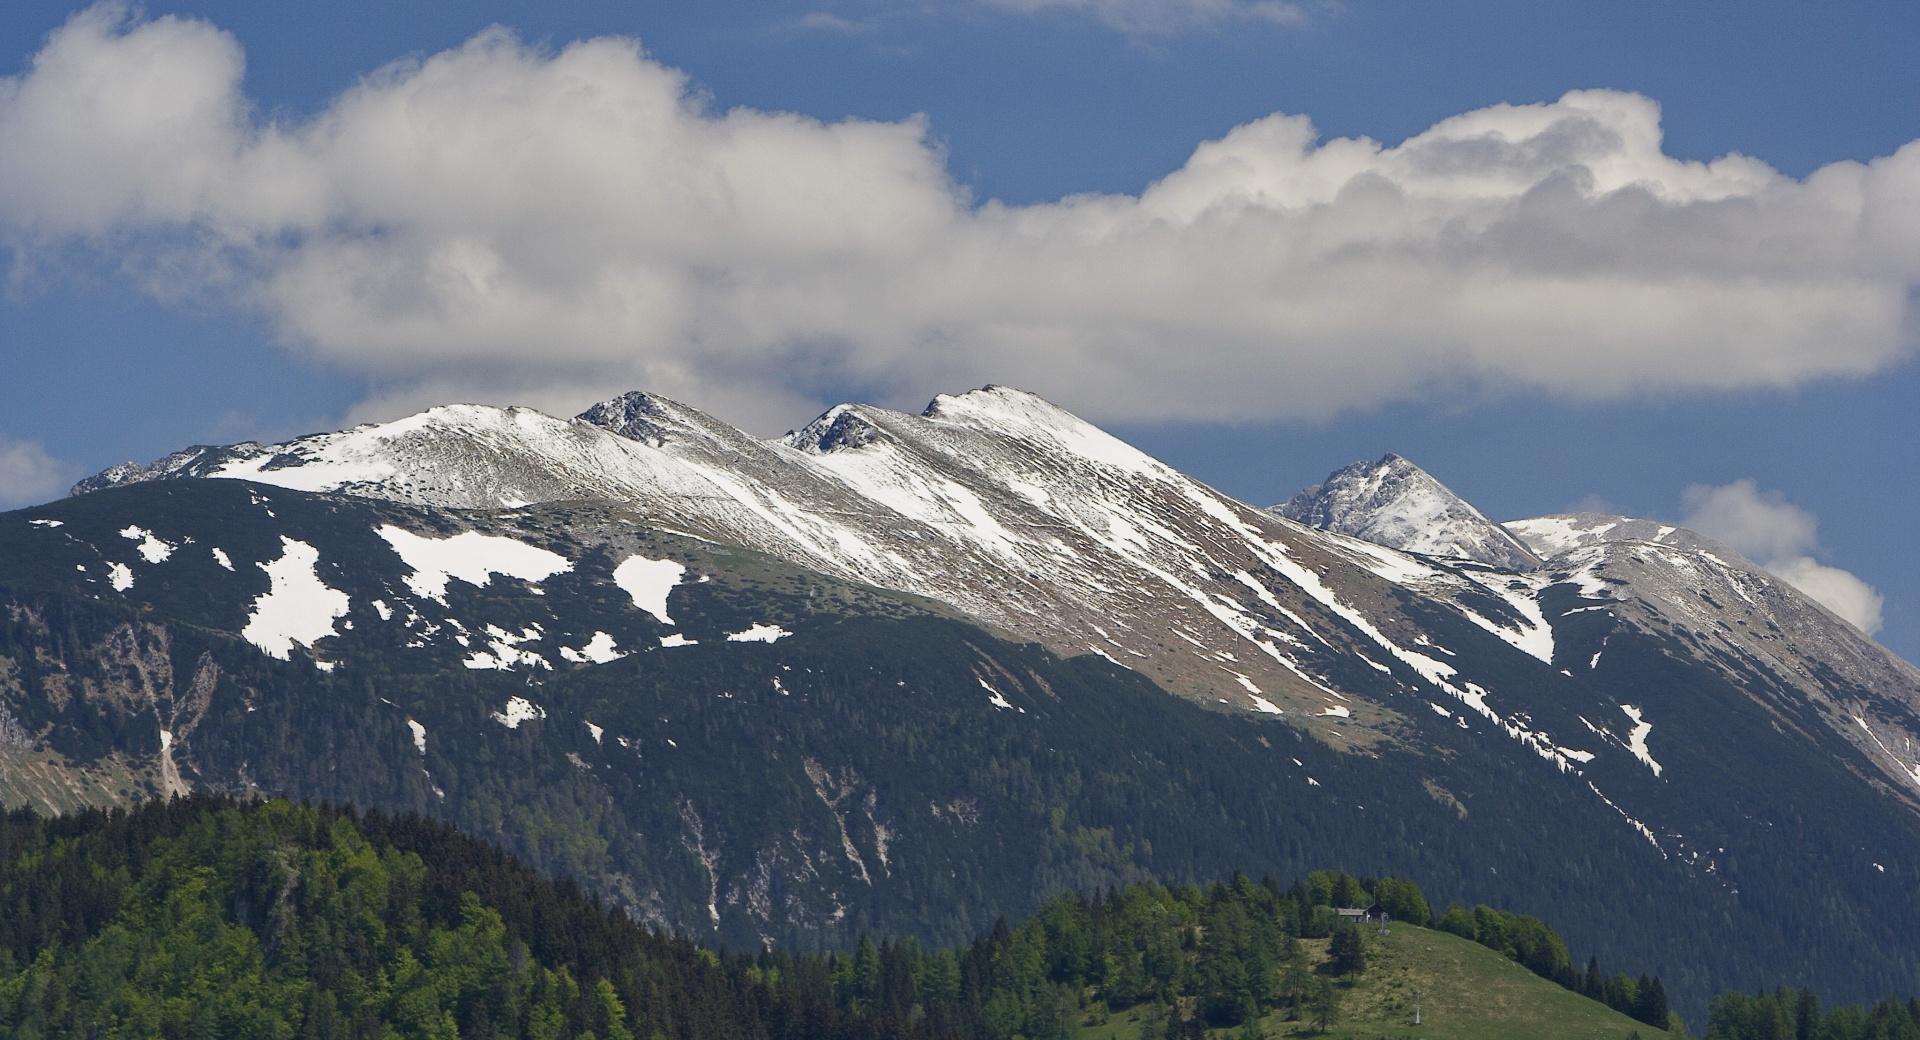 Mountain Stol, Karavanke Alps wallpapers HD quality